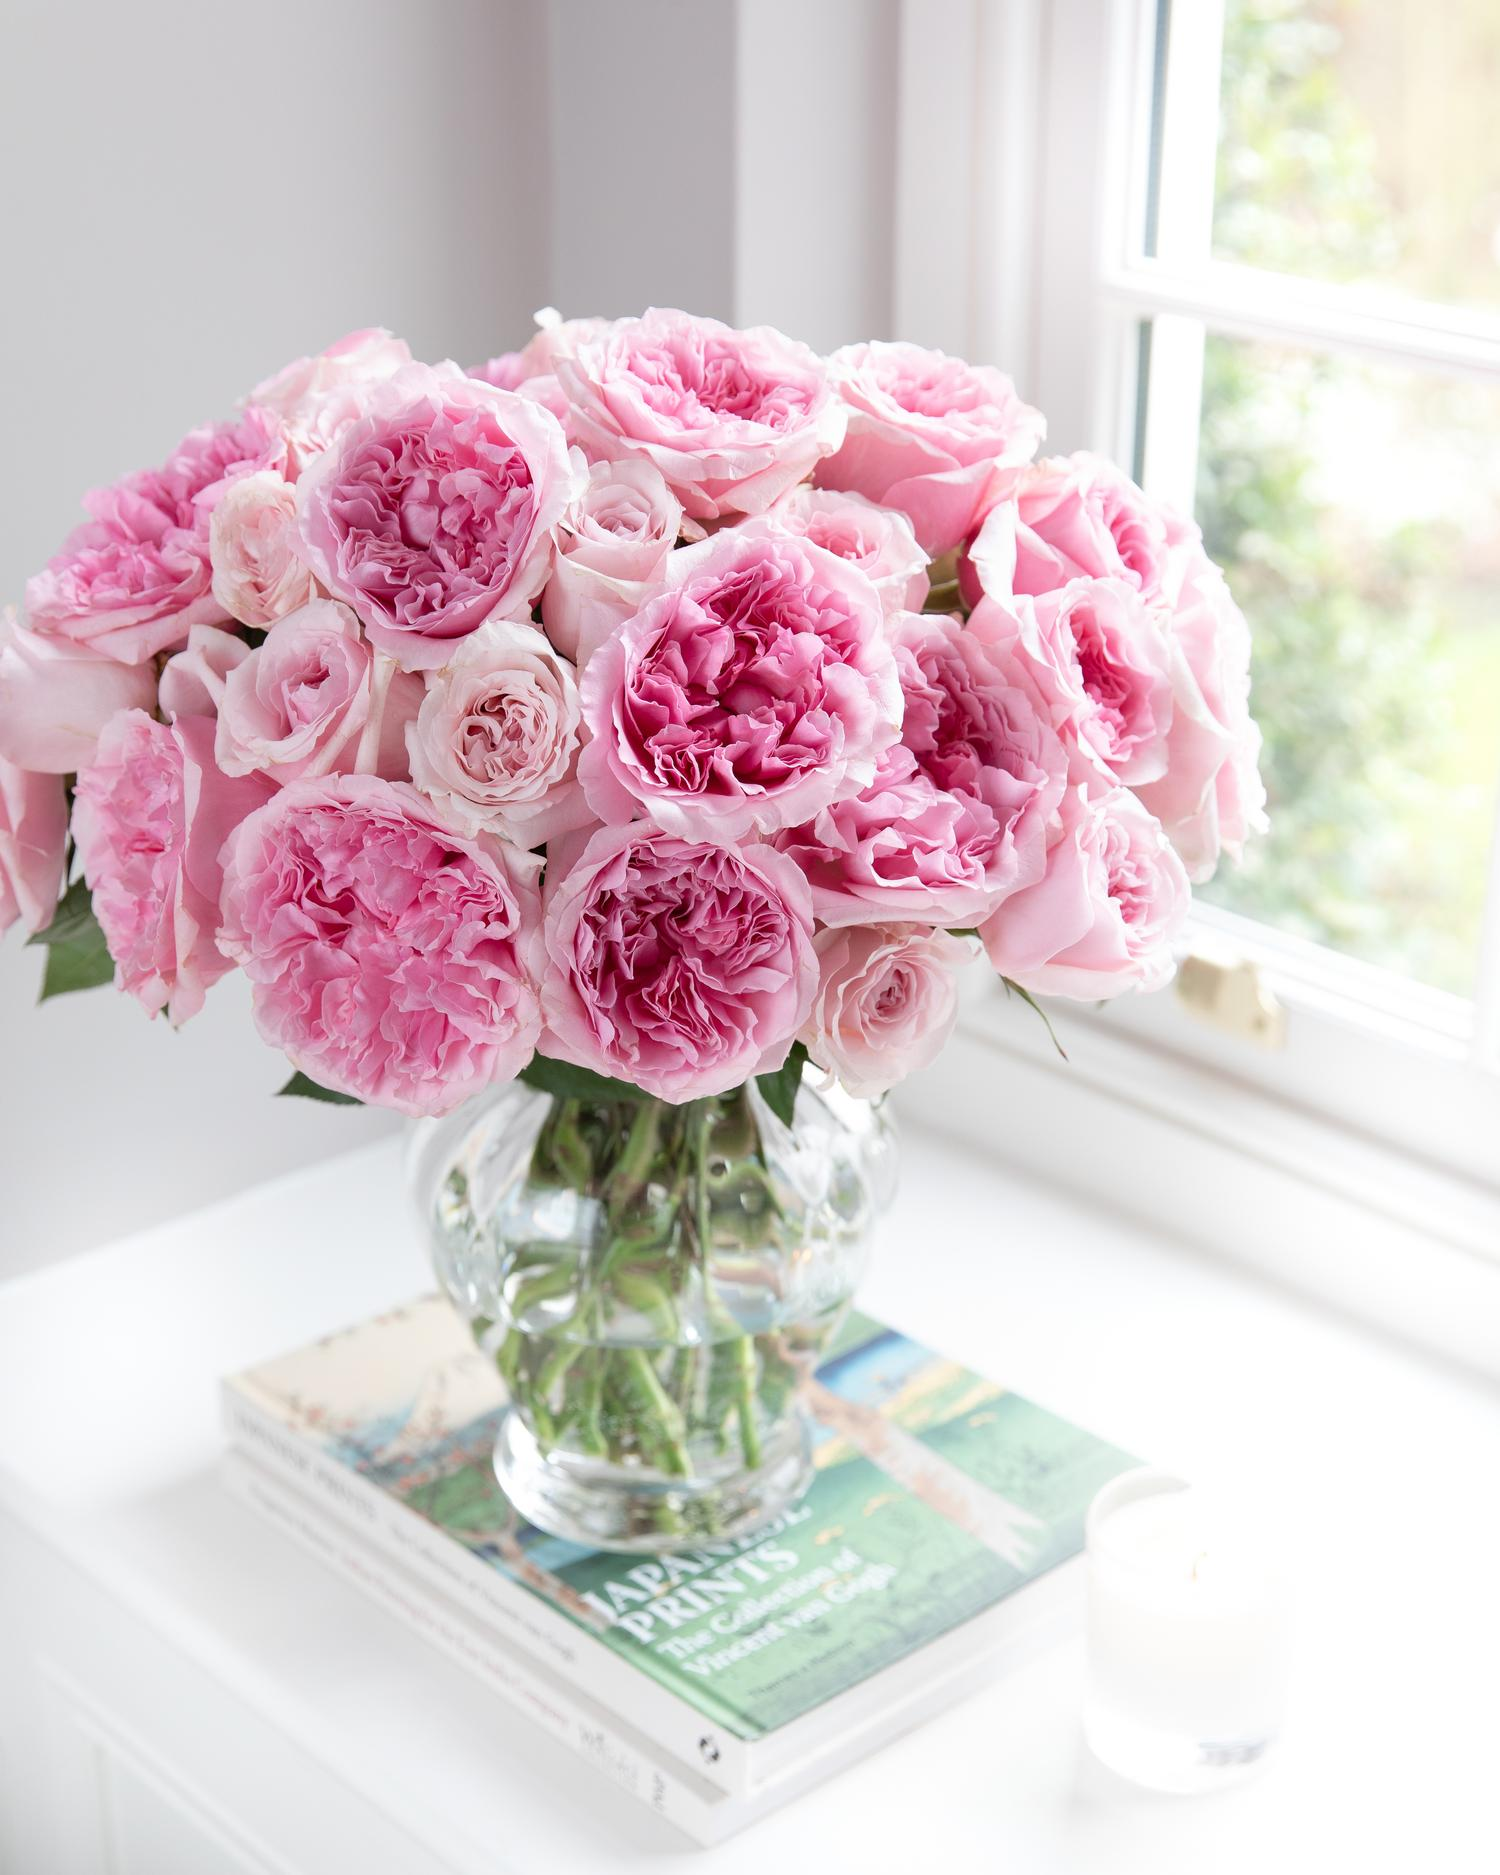 Miranda Pink Roses in Glass Vase Arrangement on Windowsill